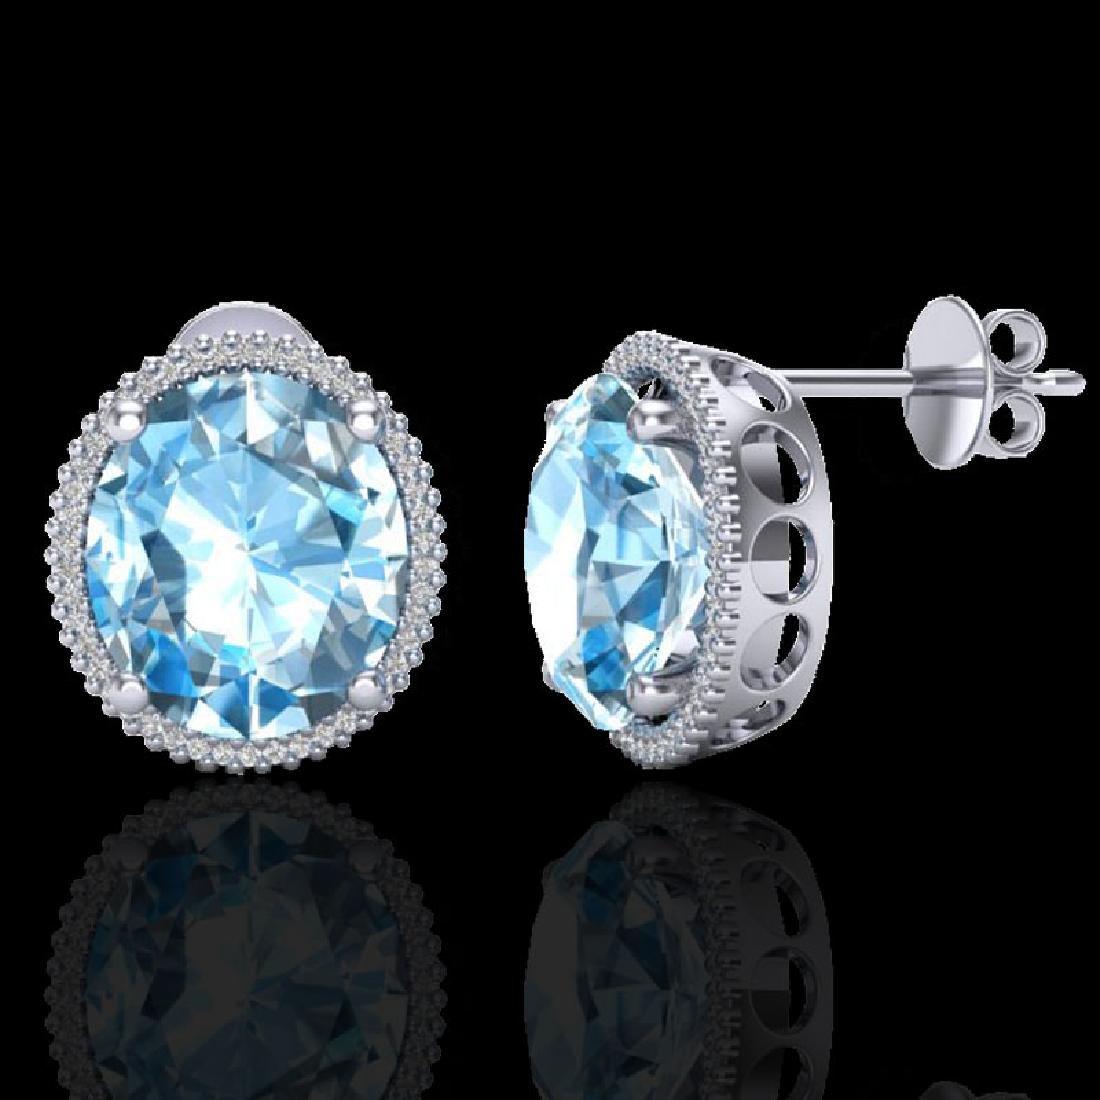 25 CTW Sky Blue Topaz & Micro VS/SI Diamond Halo - 2